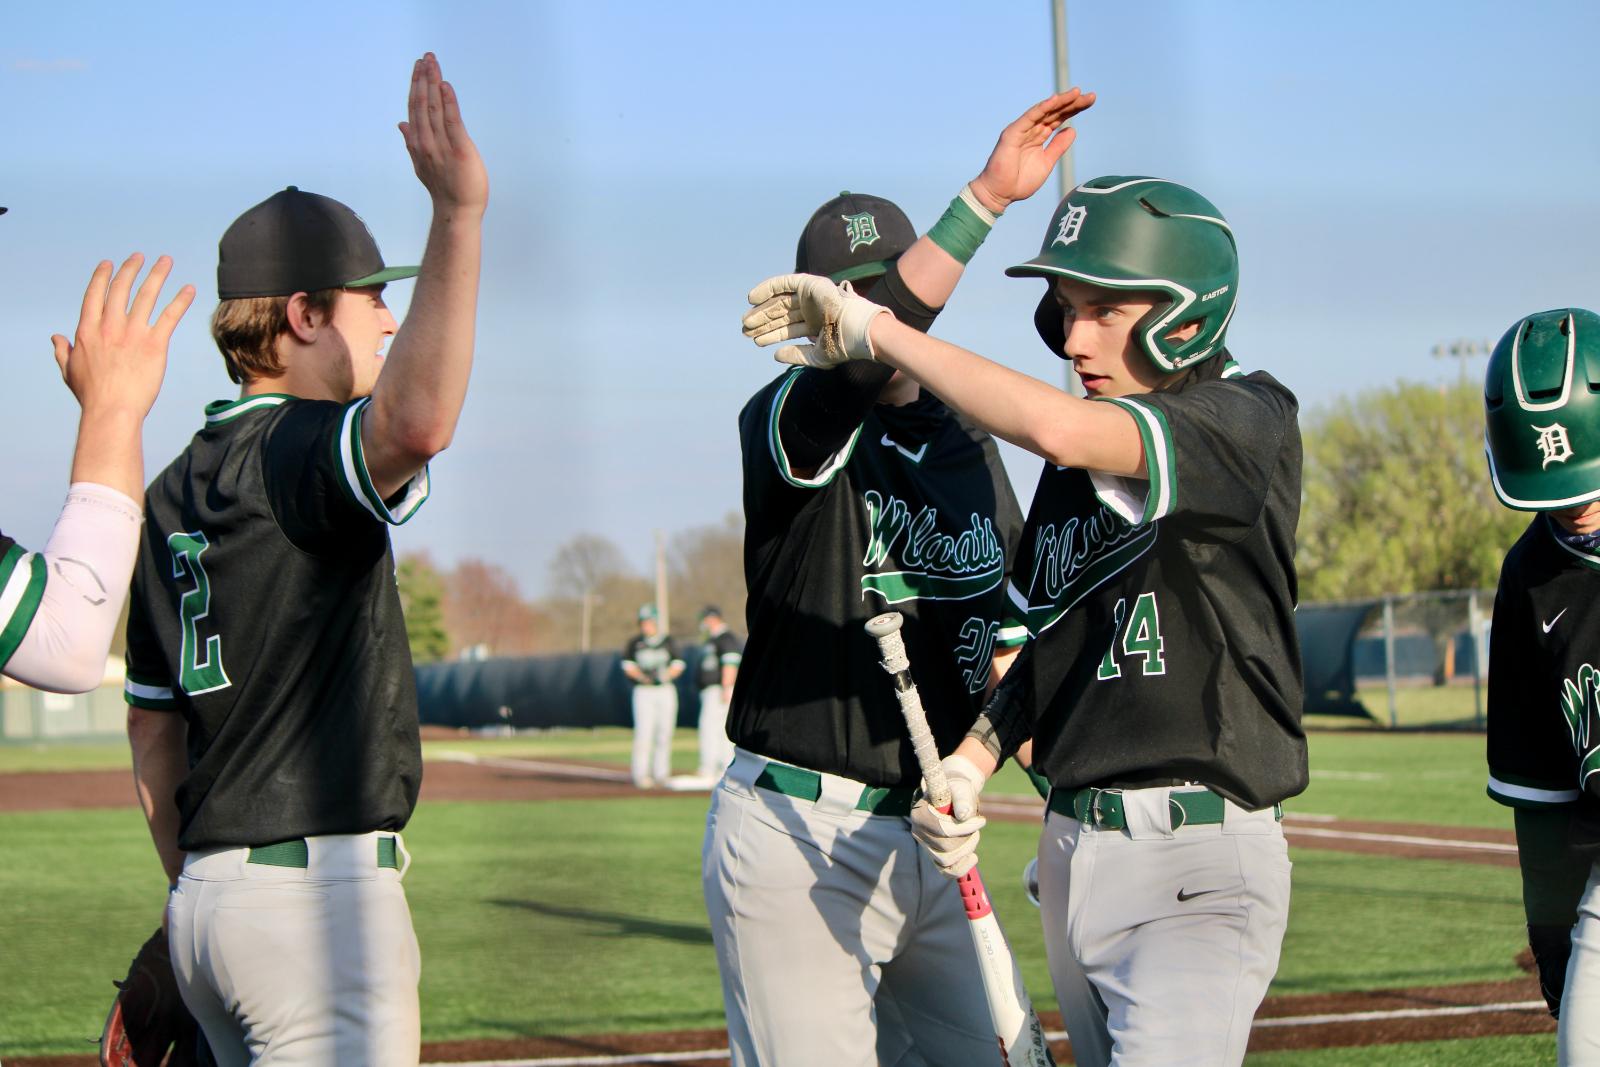 PHOTOS: Varsity Baseball @Seaman 4.5.21